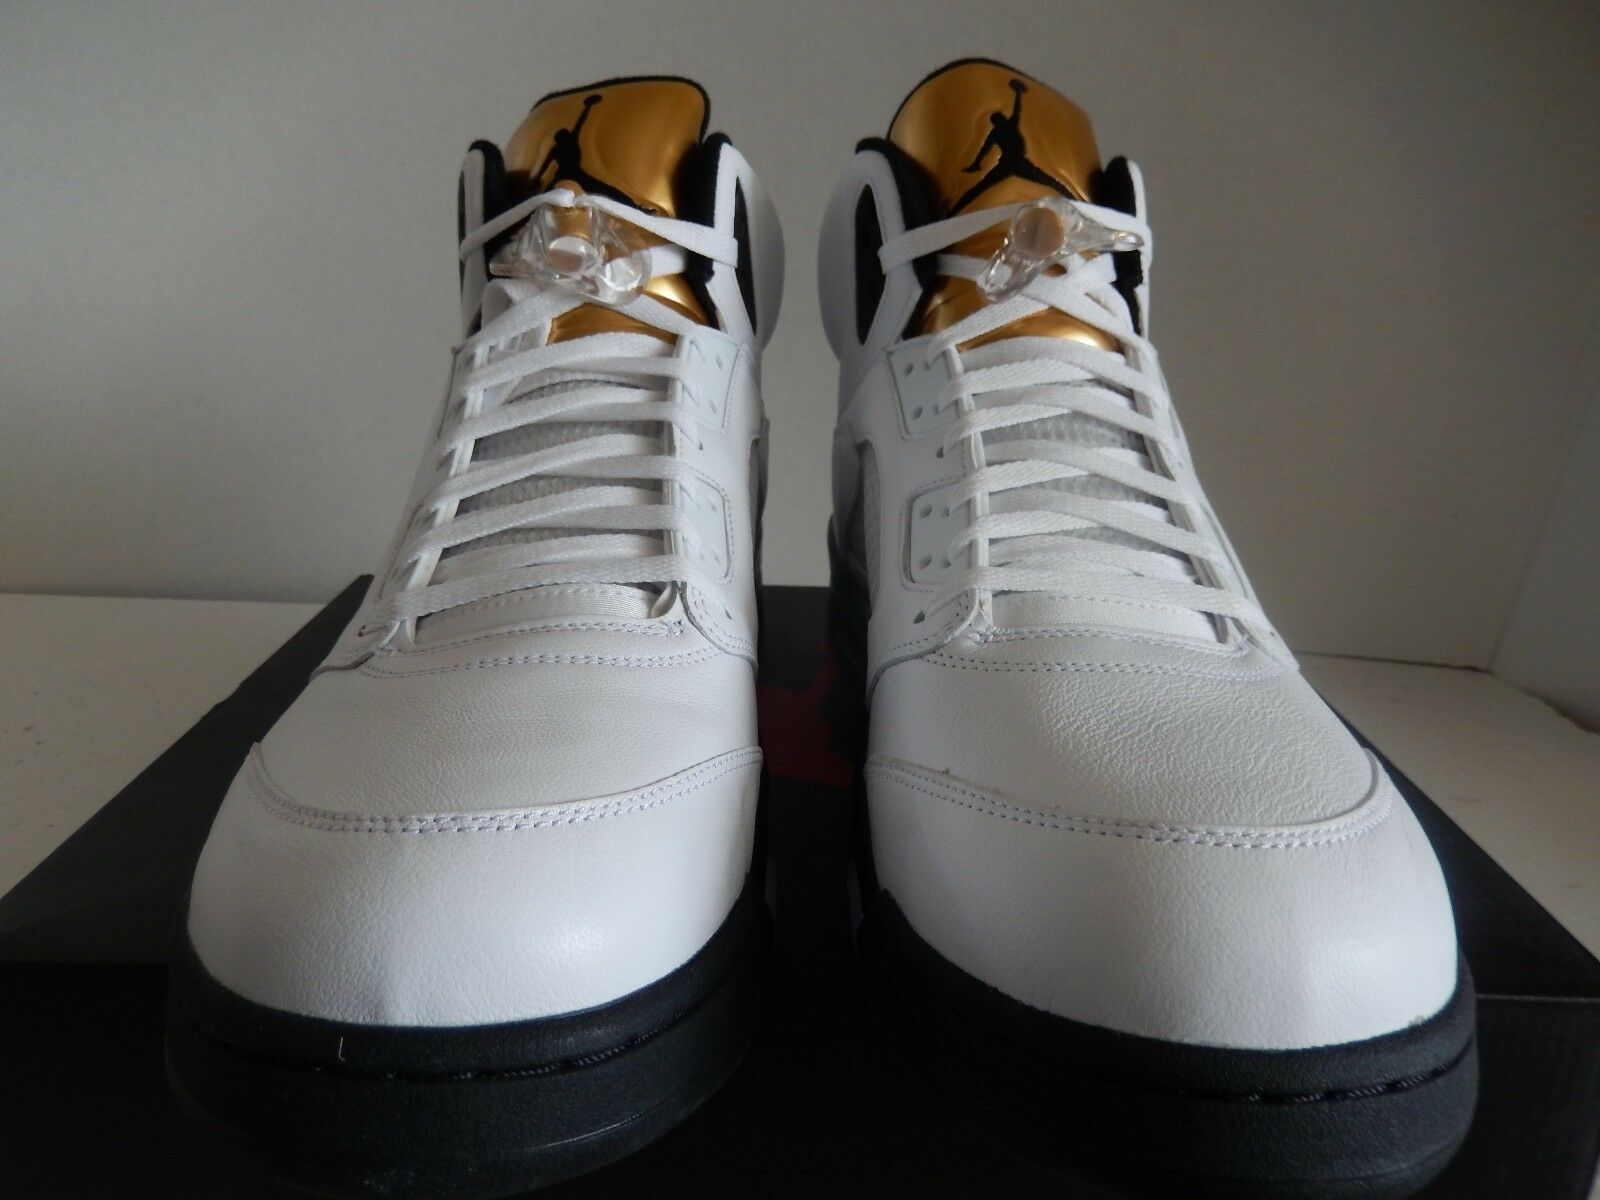 buy online 82a7b 4eb5d ... NIKE AIR JORDAN 5 RETRO WHITE-BLACK-METALLIC WHITE-BLACK-METALLIC WHITE  ...